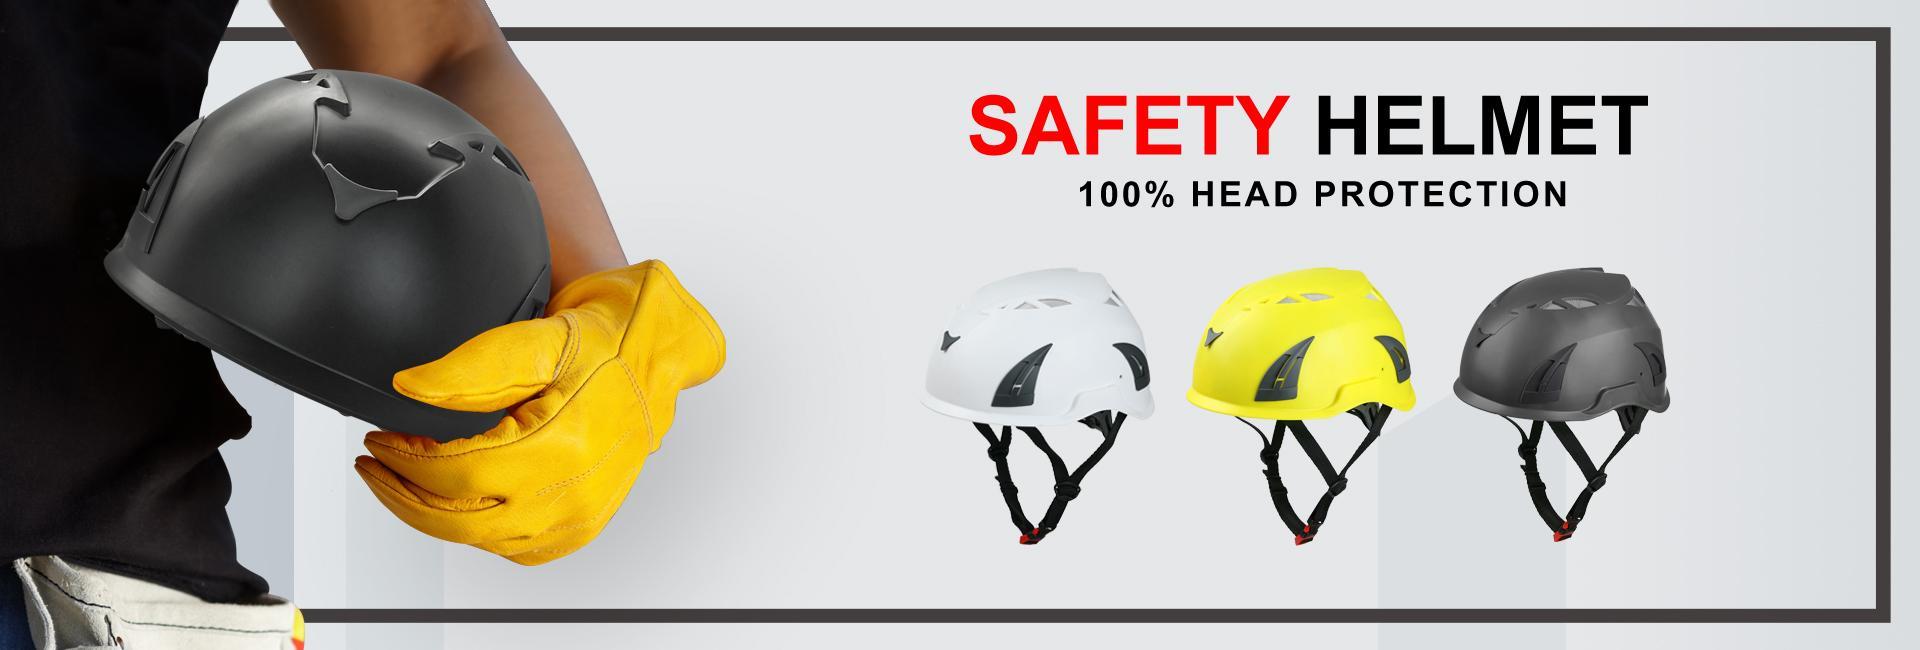 Water Rescue Helmet 6